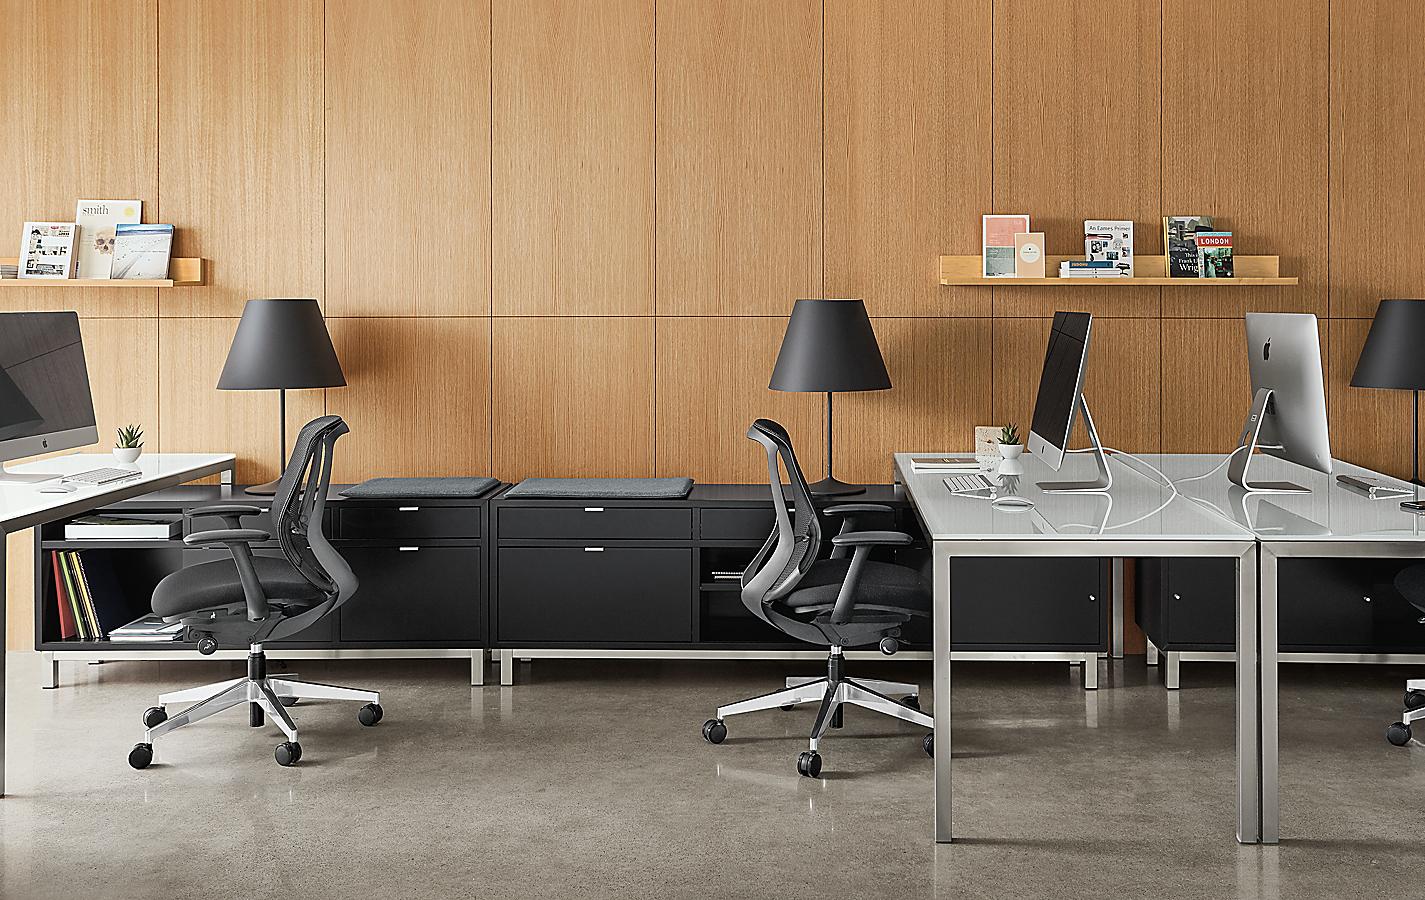 Copenhagen Benching System with Parsons Desks